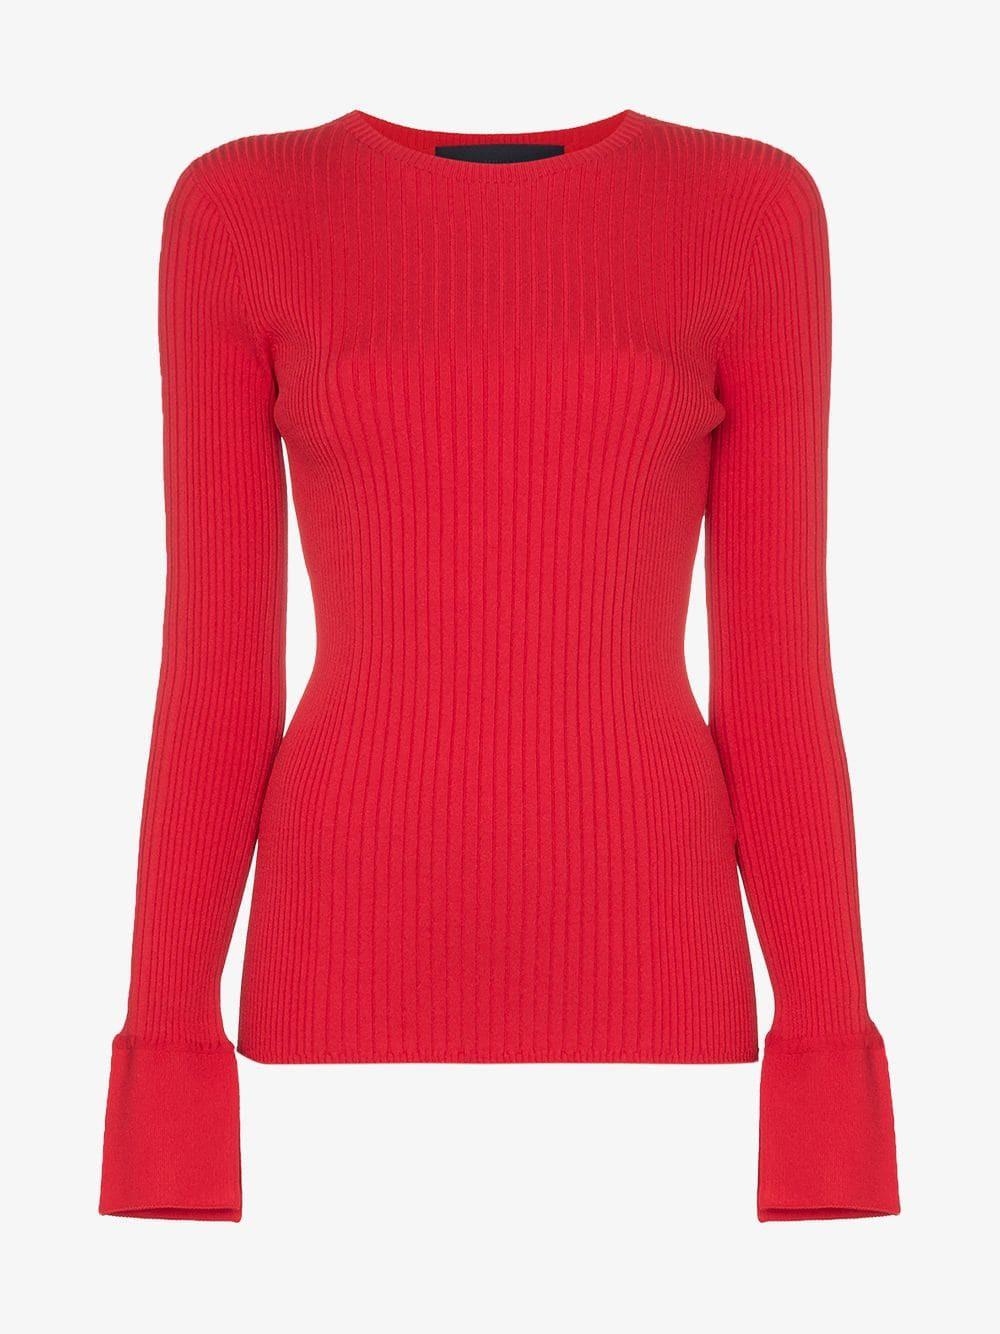 Juun.J ribbed-knit jumper in red